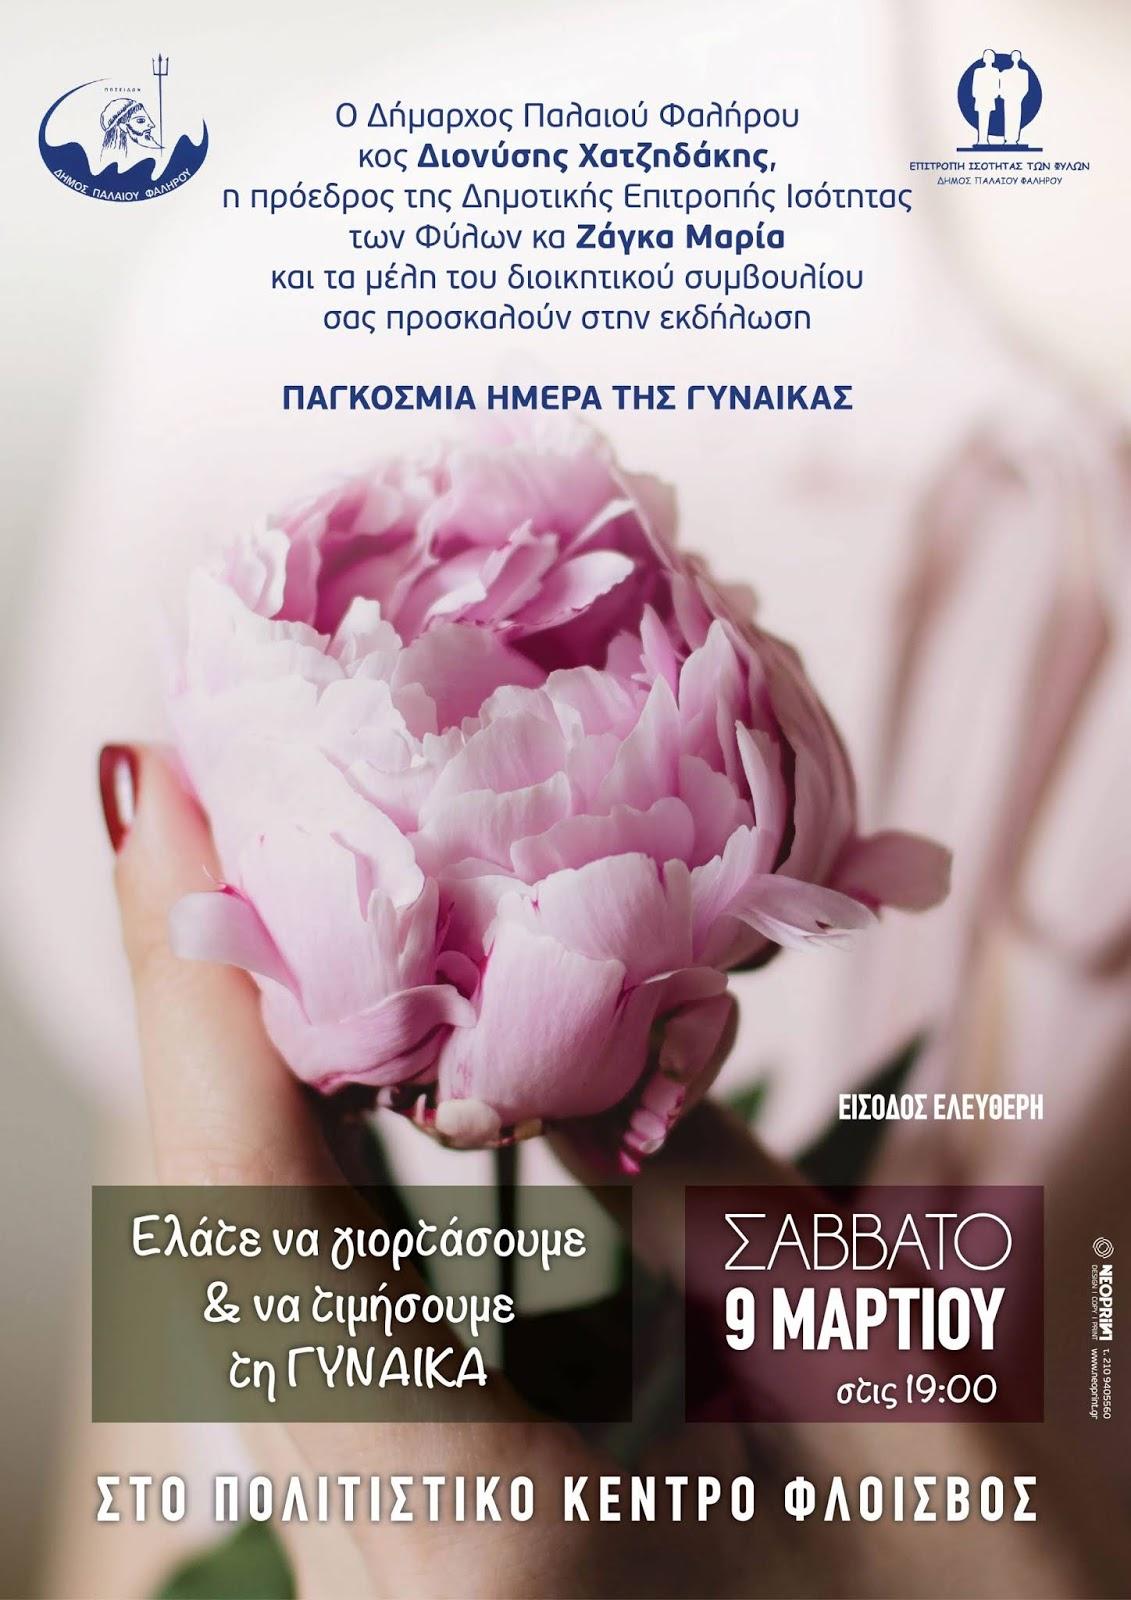 6832b272da1 Εκδήλωση για την Παγκόσμια Ημέρα της Γυναίκας....από τον Δήμο Παλαιού  Φαλήρου